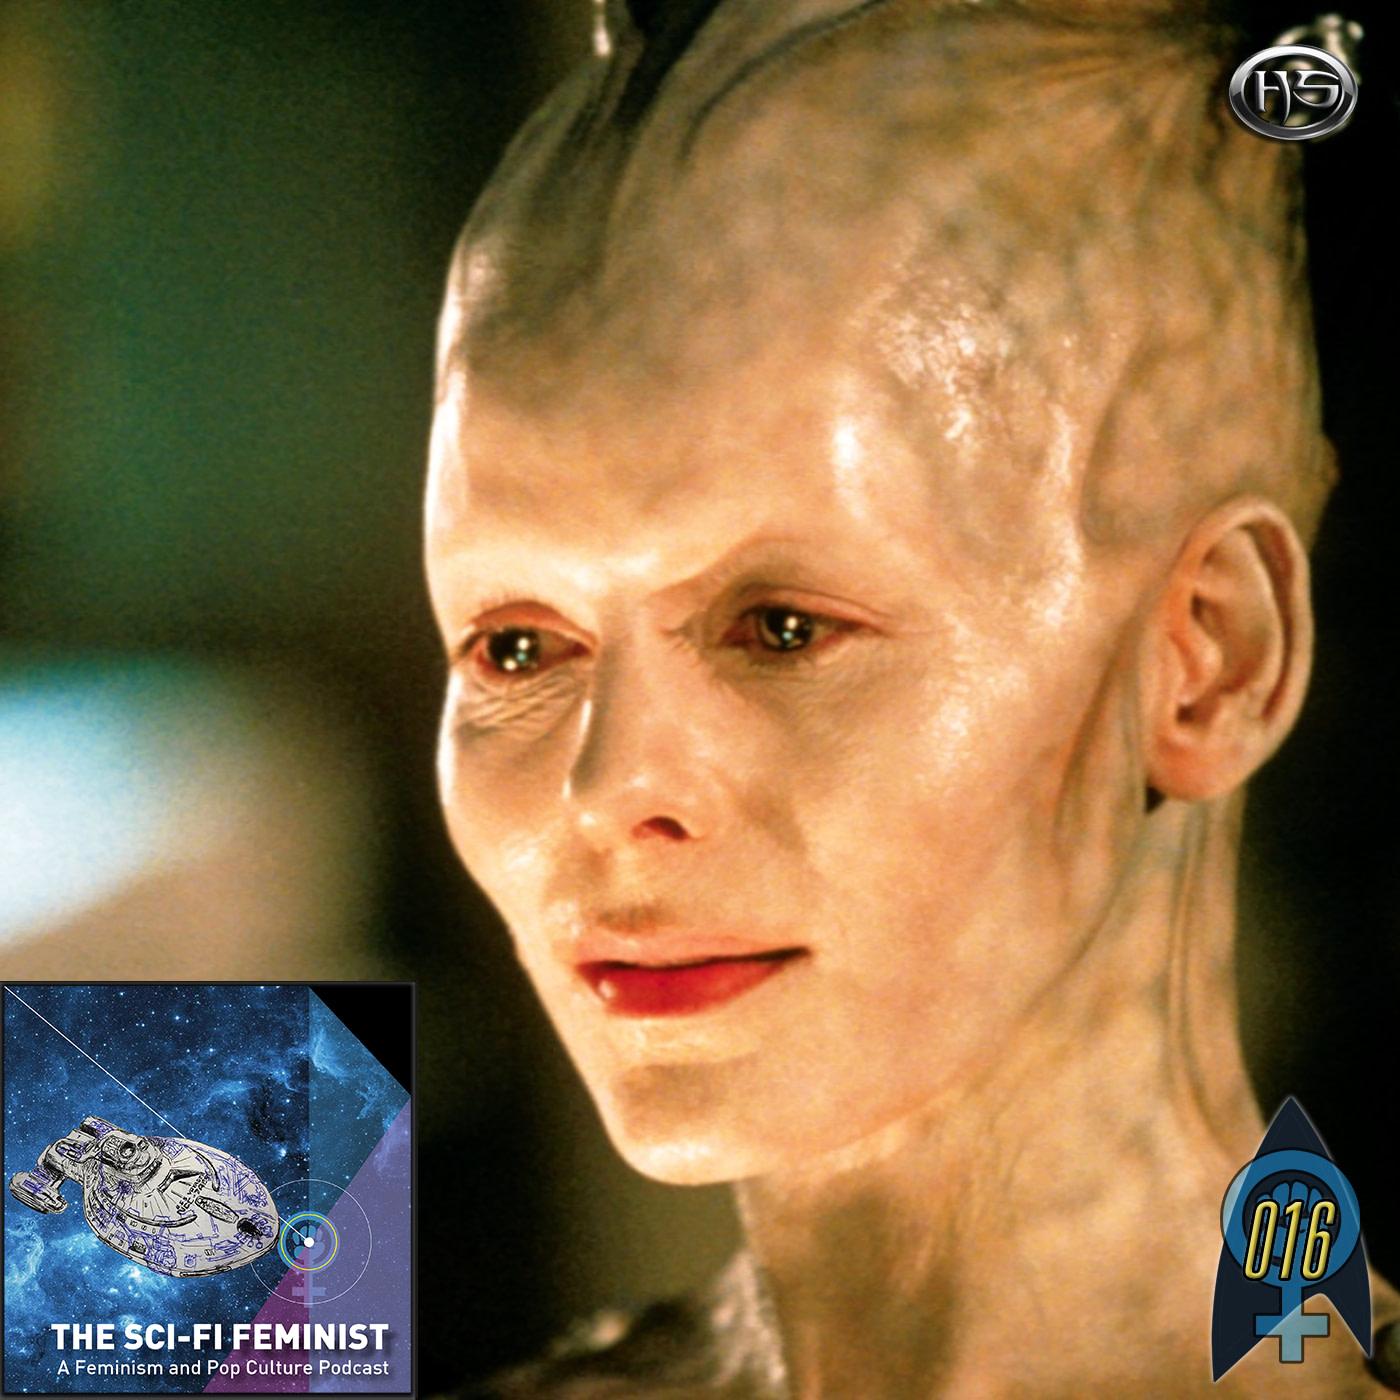 The Sci-Fi Feminist Episode 16